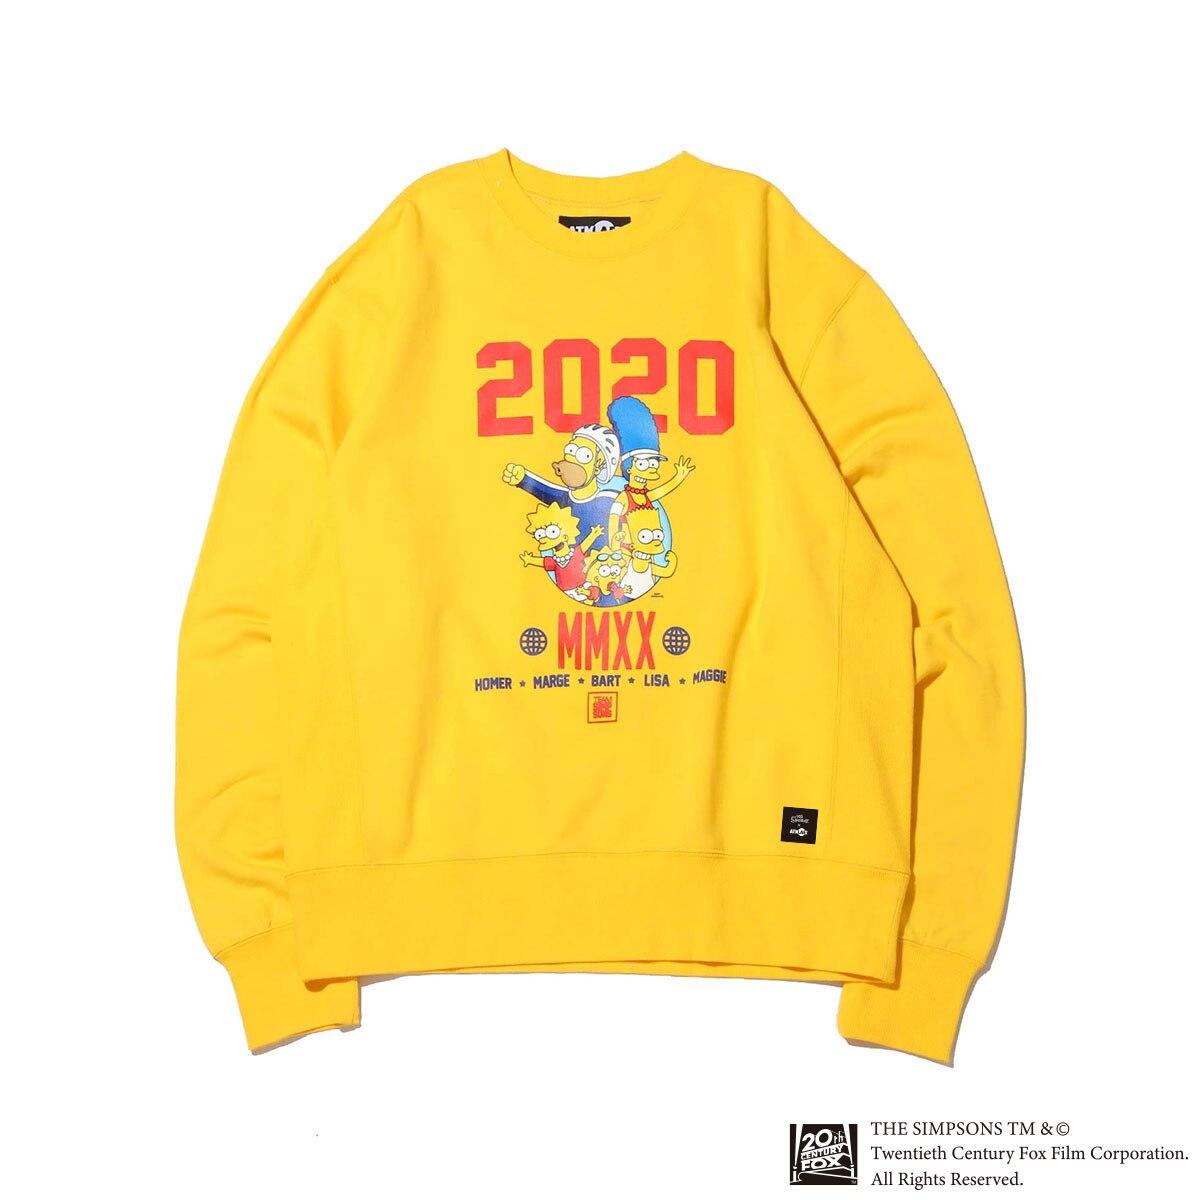 ATMOS LAB x THE SIMPSONS 2020 FAMILY CREW(YELLOW)(アトモスラボ ザ シンプソンズ 2020 ファミリー クルー)【メンズ】【スウェット】【20SP-S】